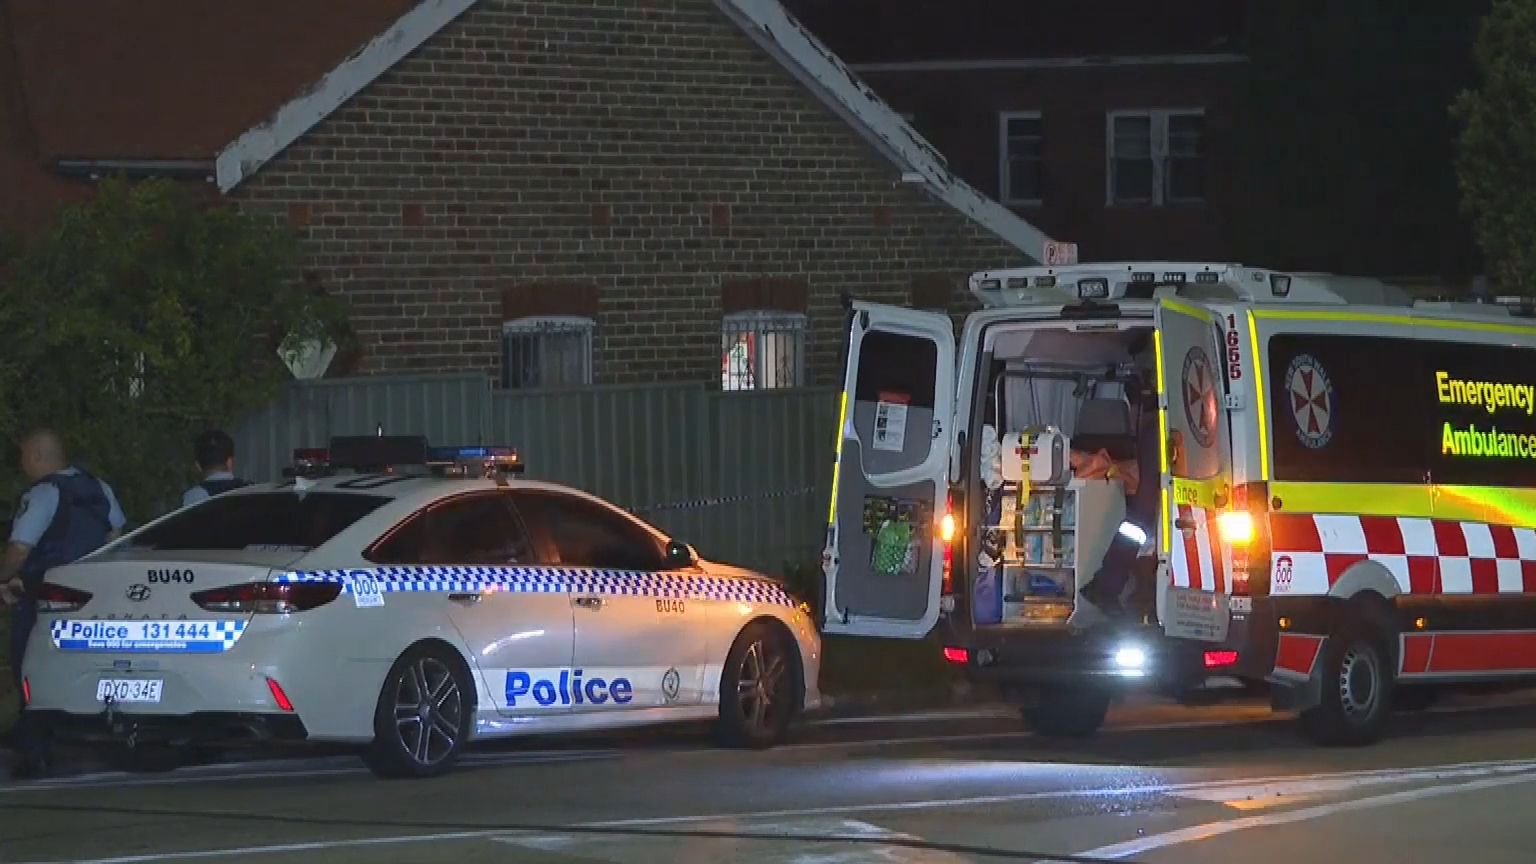 Elderly woman attacked in alleged home invasion in Sydney's west